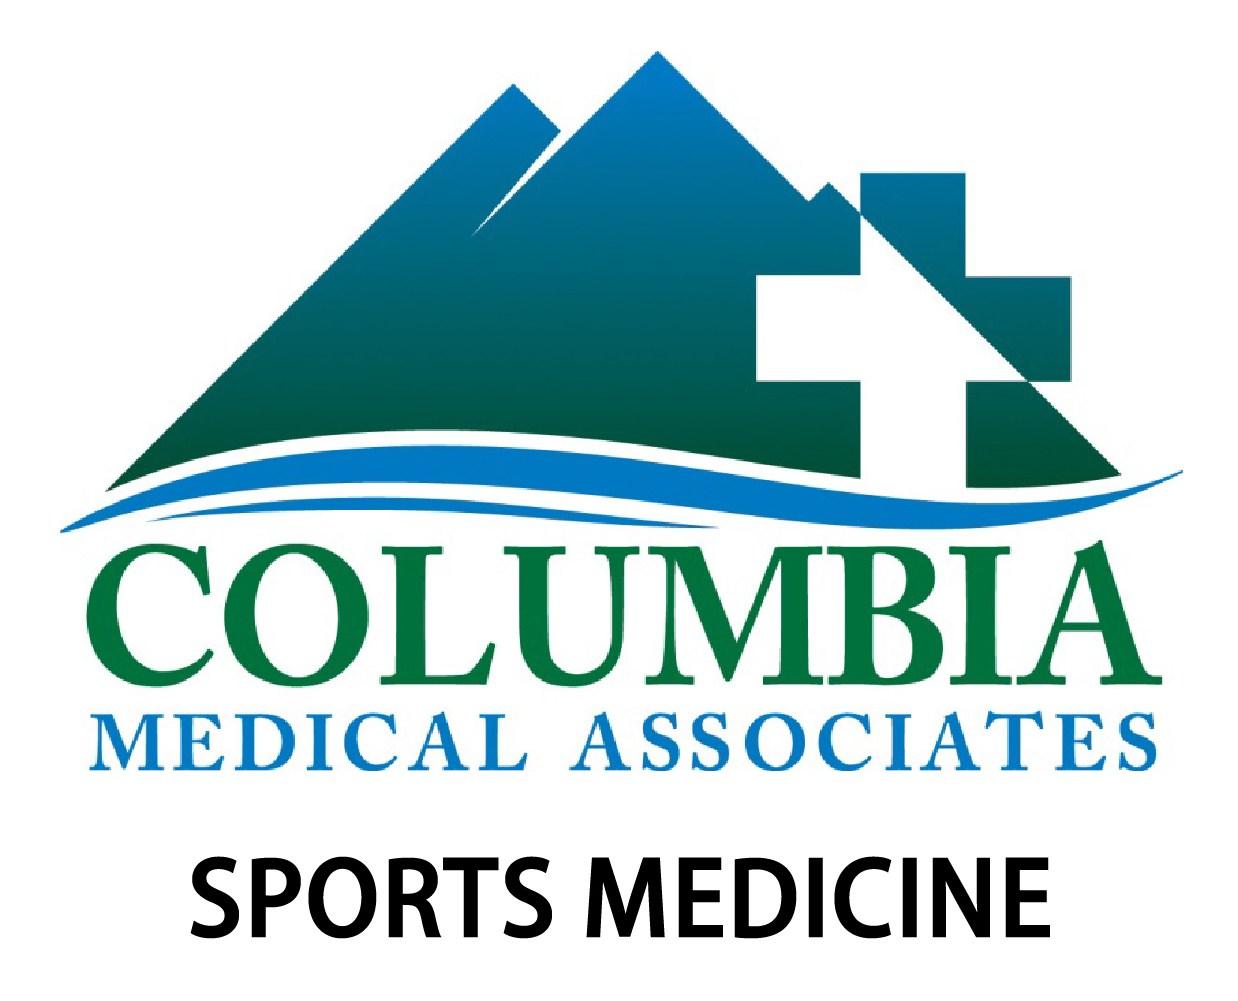 Columbia Medical Associates